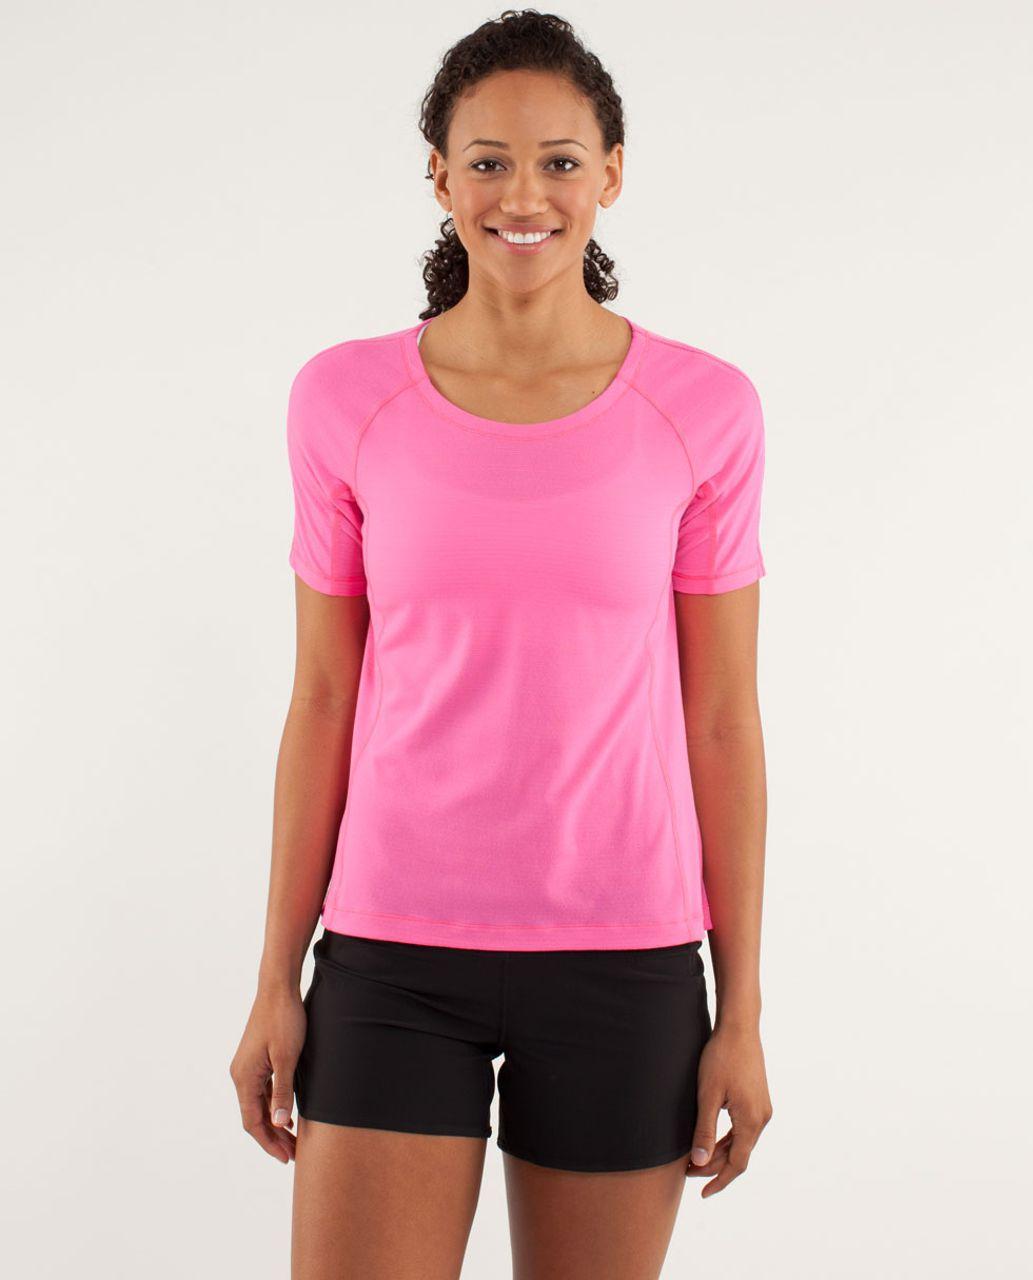 Lululemon Run:  Silver Lining Short Sleeve - Pinkelicious / Parfait Pink